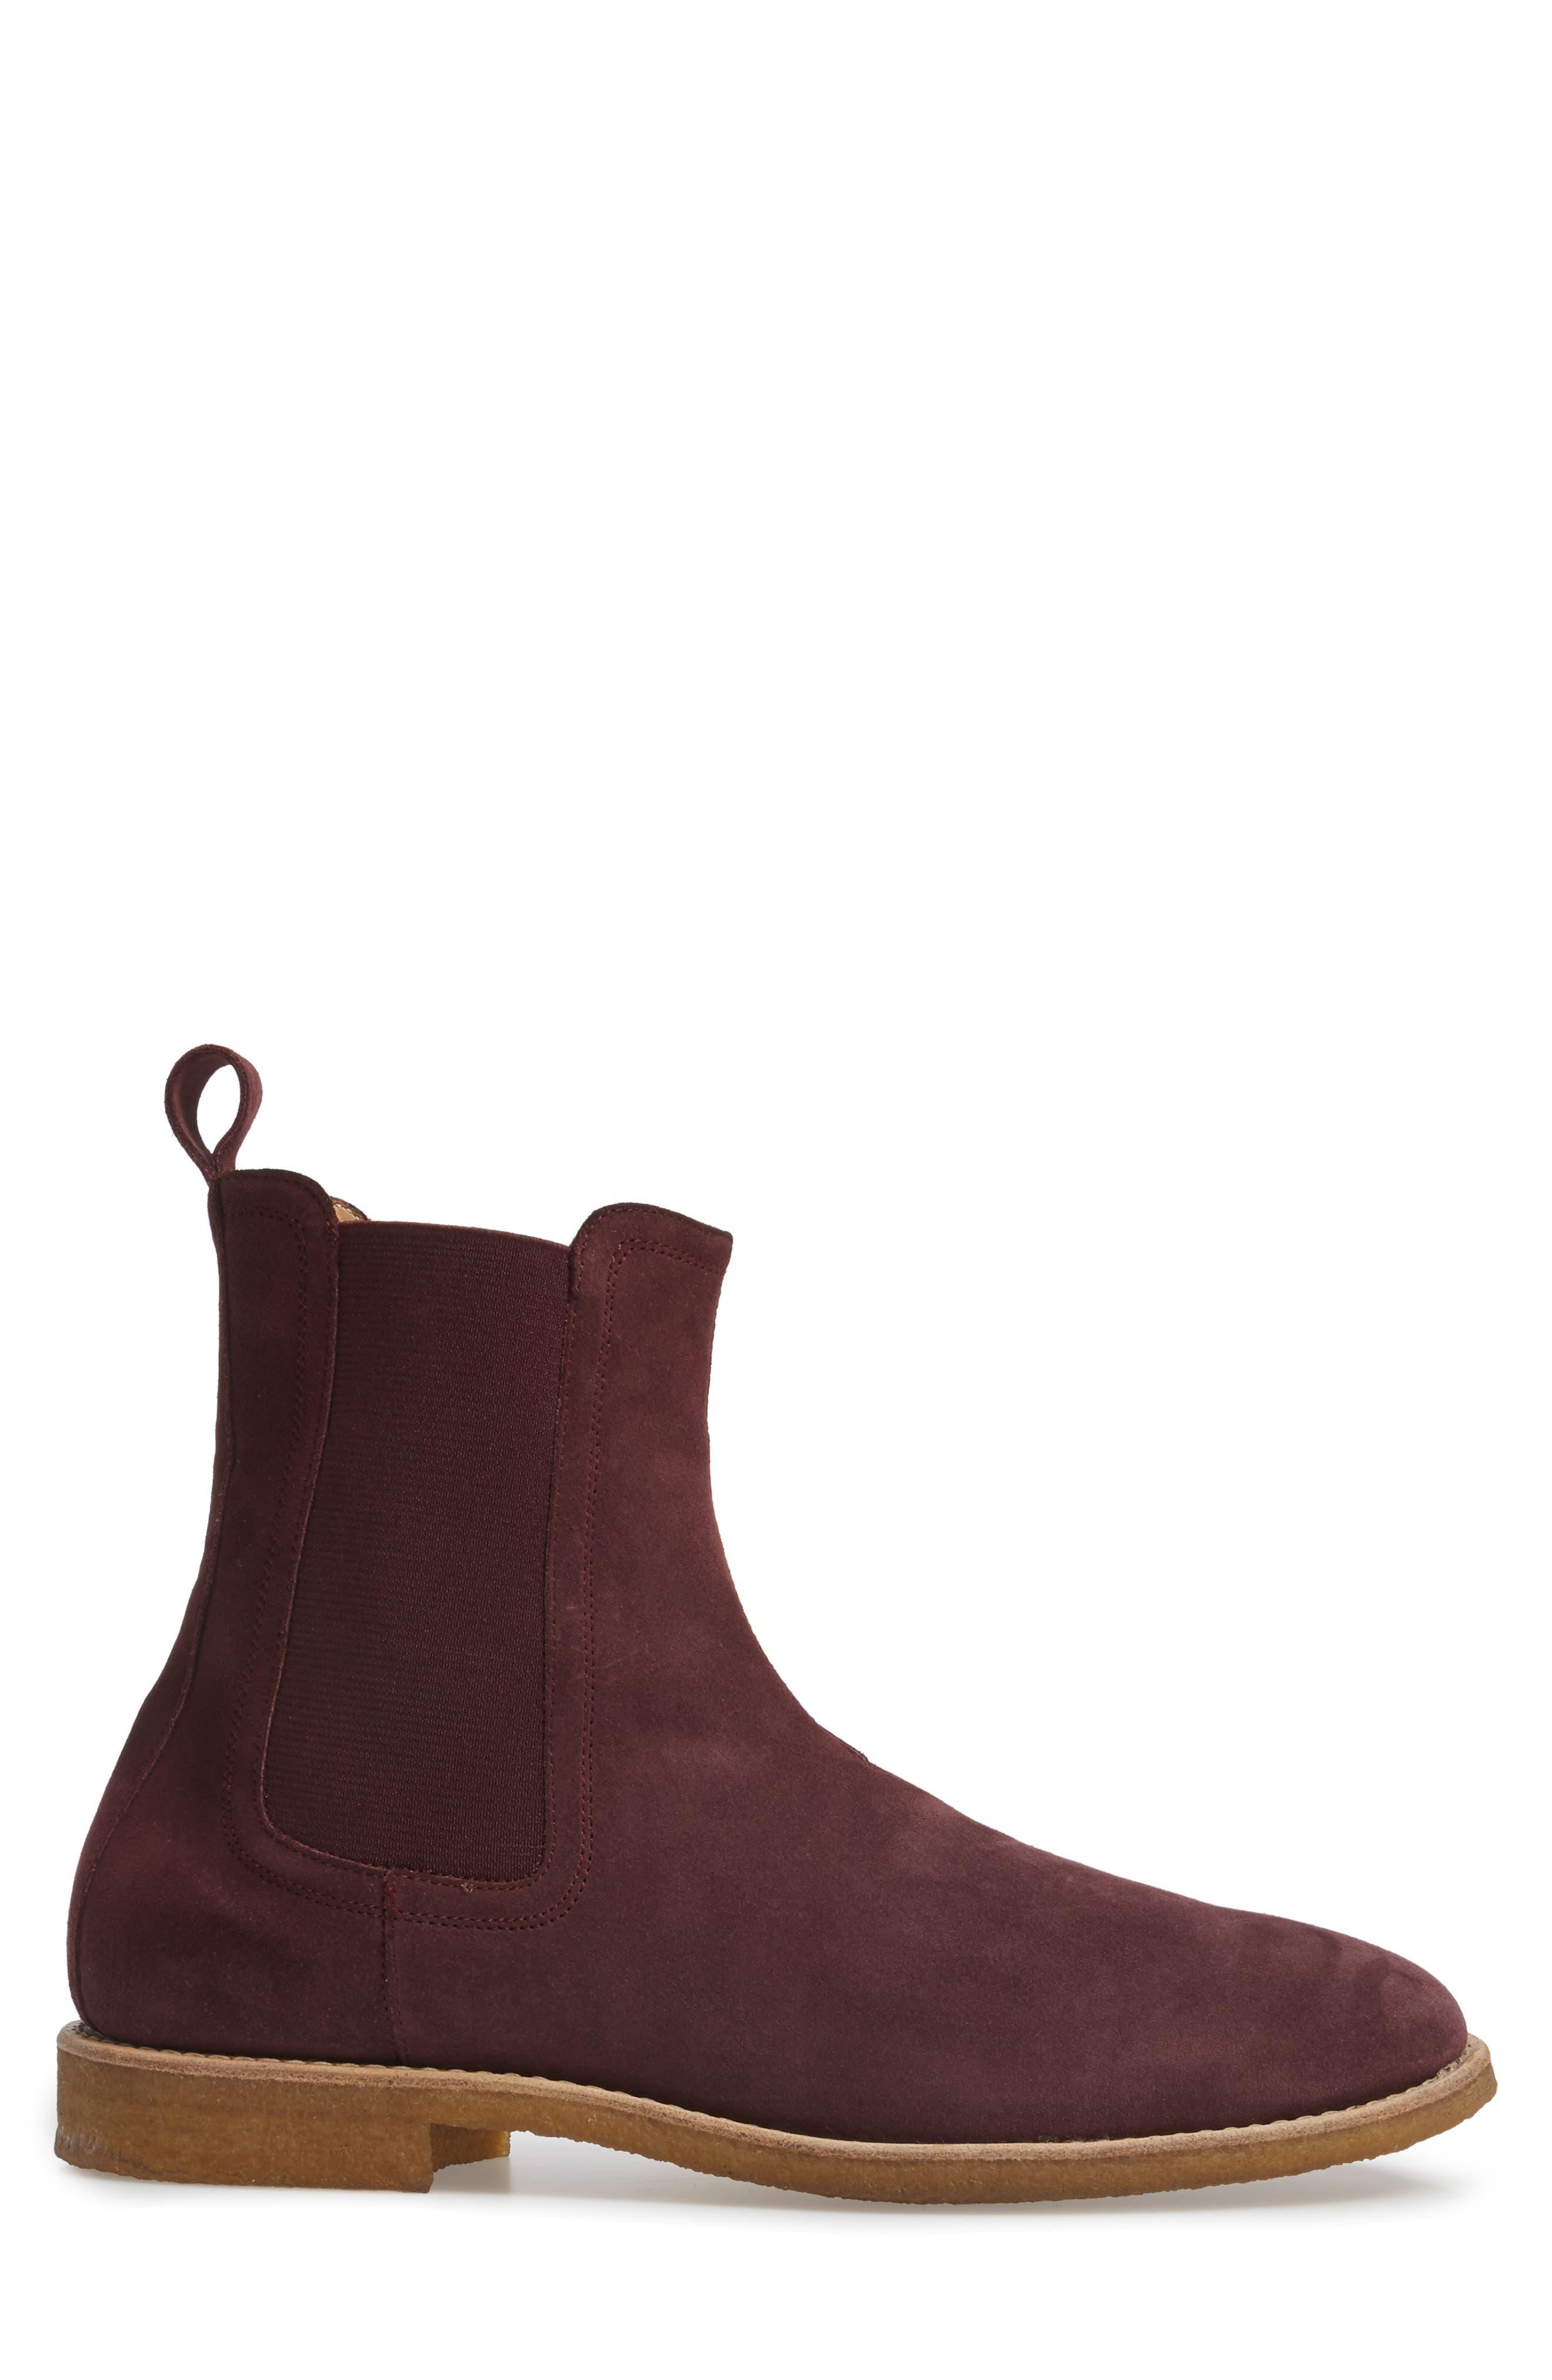 Chelsea Boot,                             Alternate thumbnail 4, color,                             Prunga Burgundy